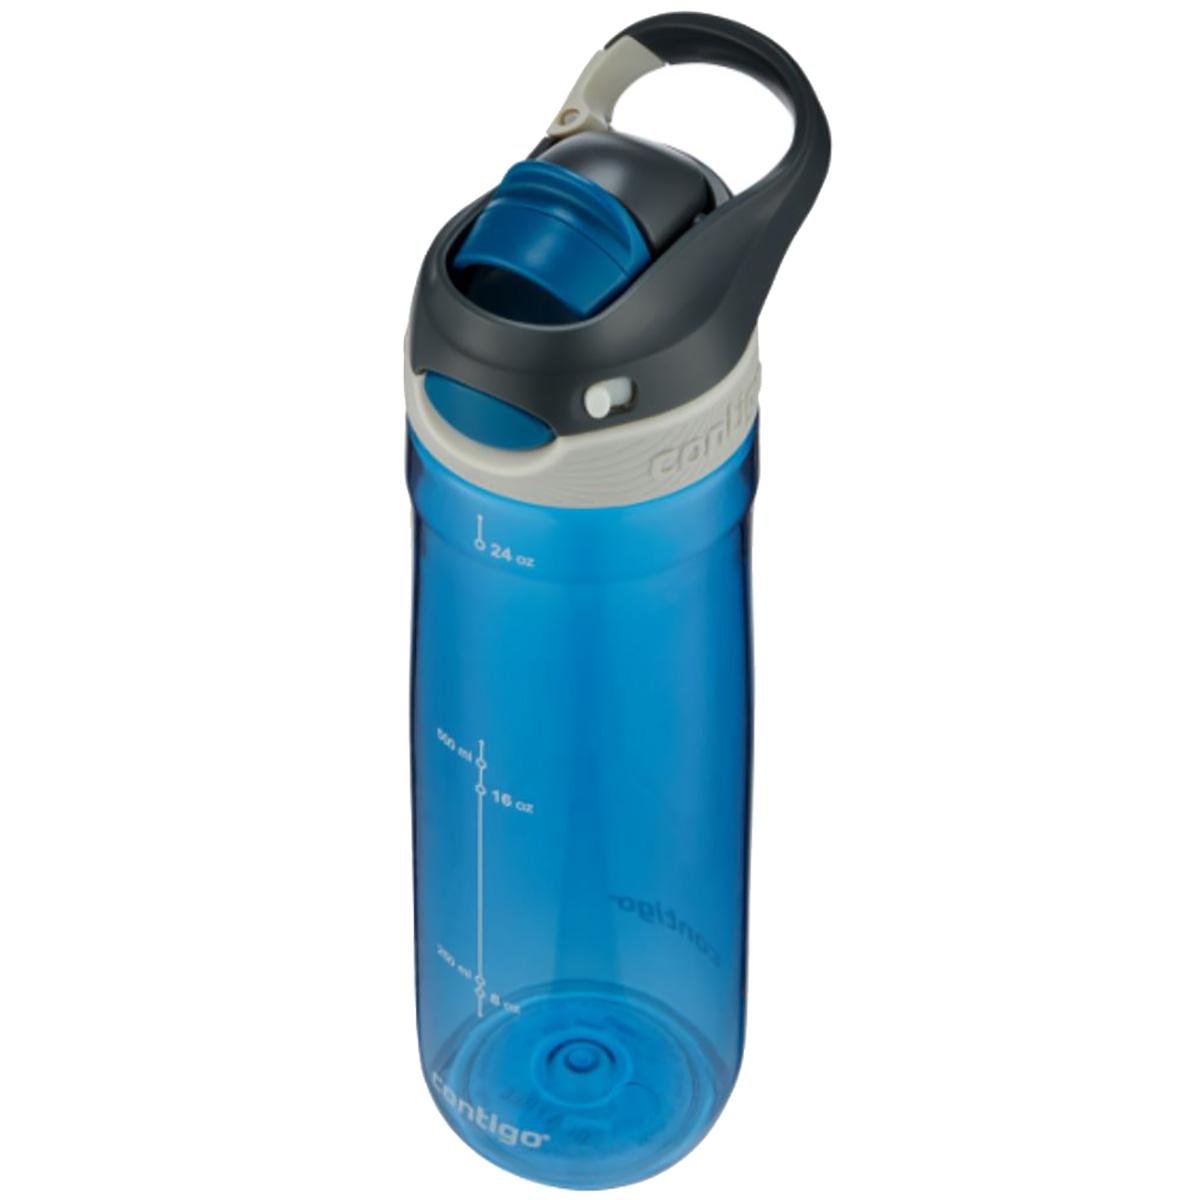 Contigo-24-oz-Chug-Autospout-Leak-Proof-Water-Bottle miniatuur 12